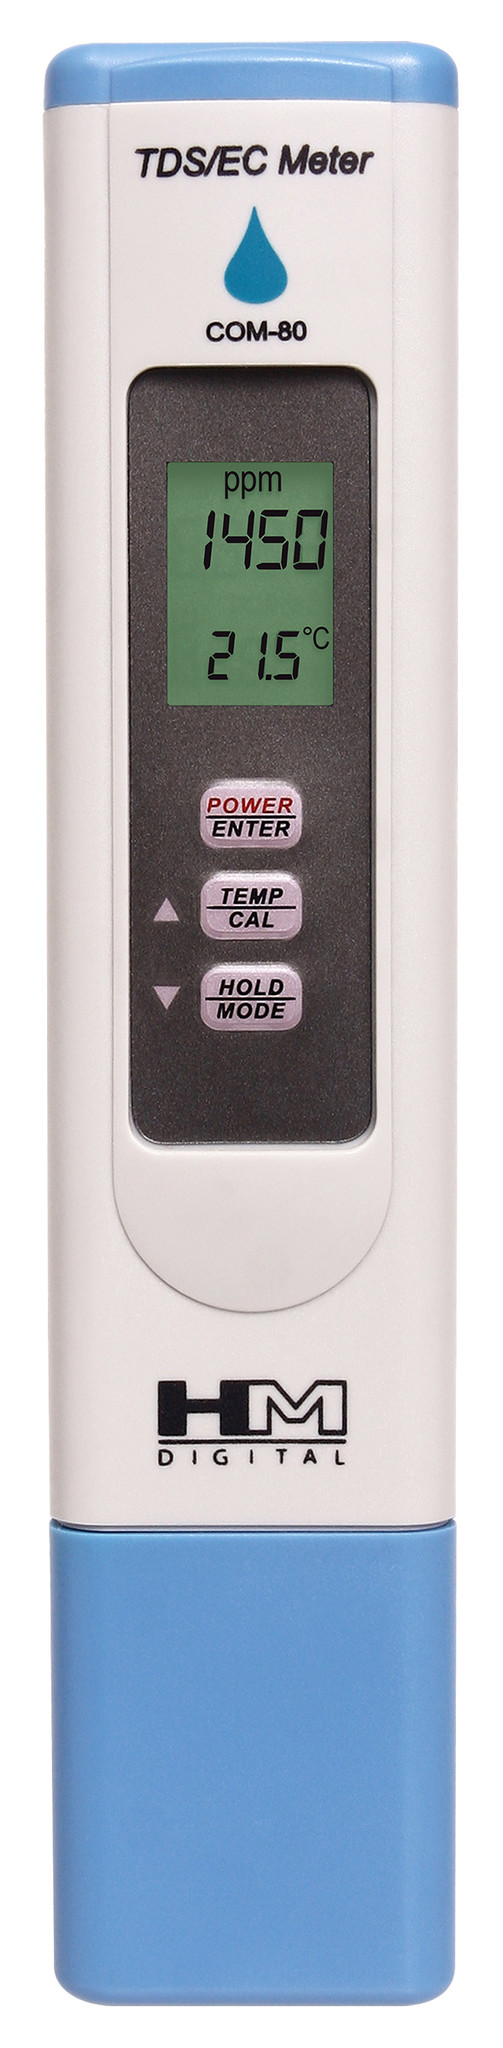 EC/TDS HydroTester Model COM-80